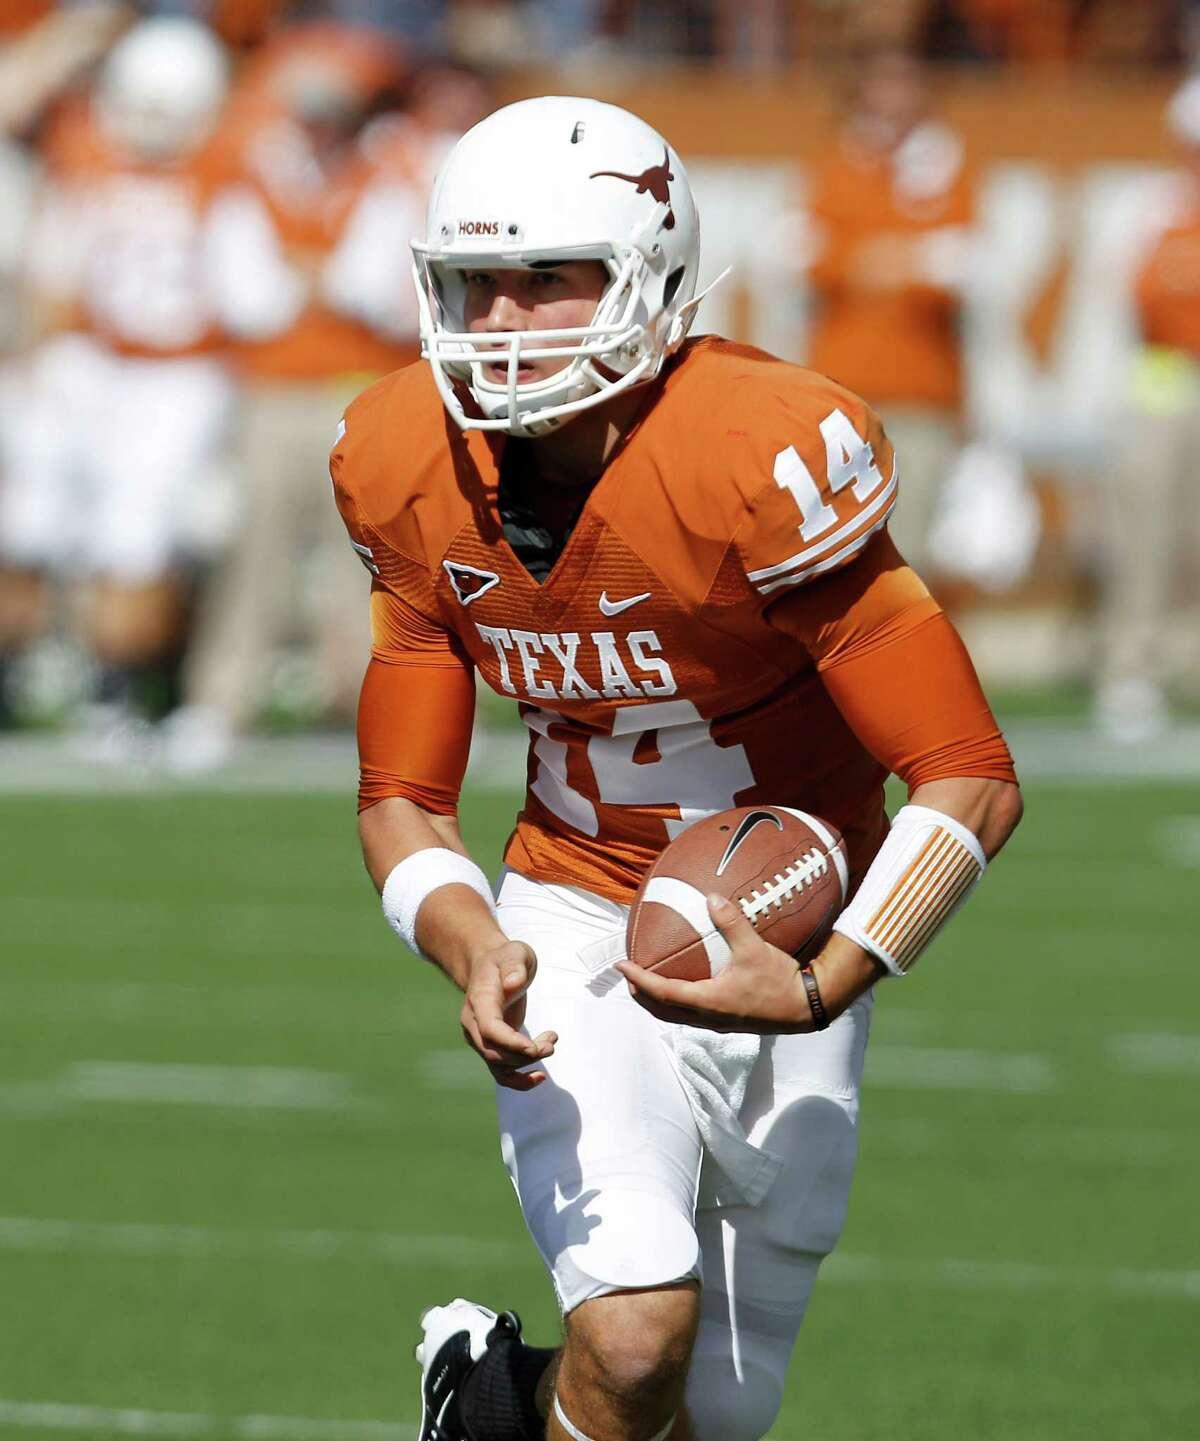 Texas' David Ash during the first quarter of an NCAA college football game against Texas Tech, Saturday, Nov. 5, 2011, in Austin, Texas. (AP Photo/Eric Gay)